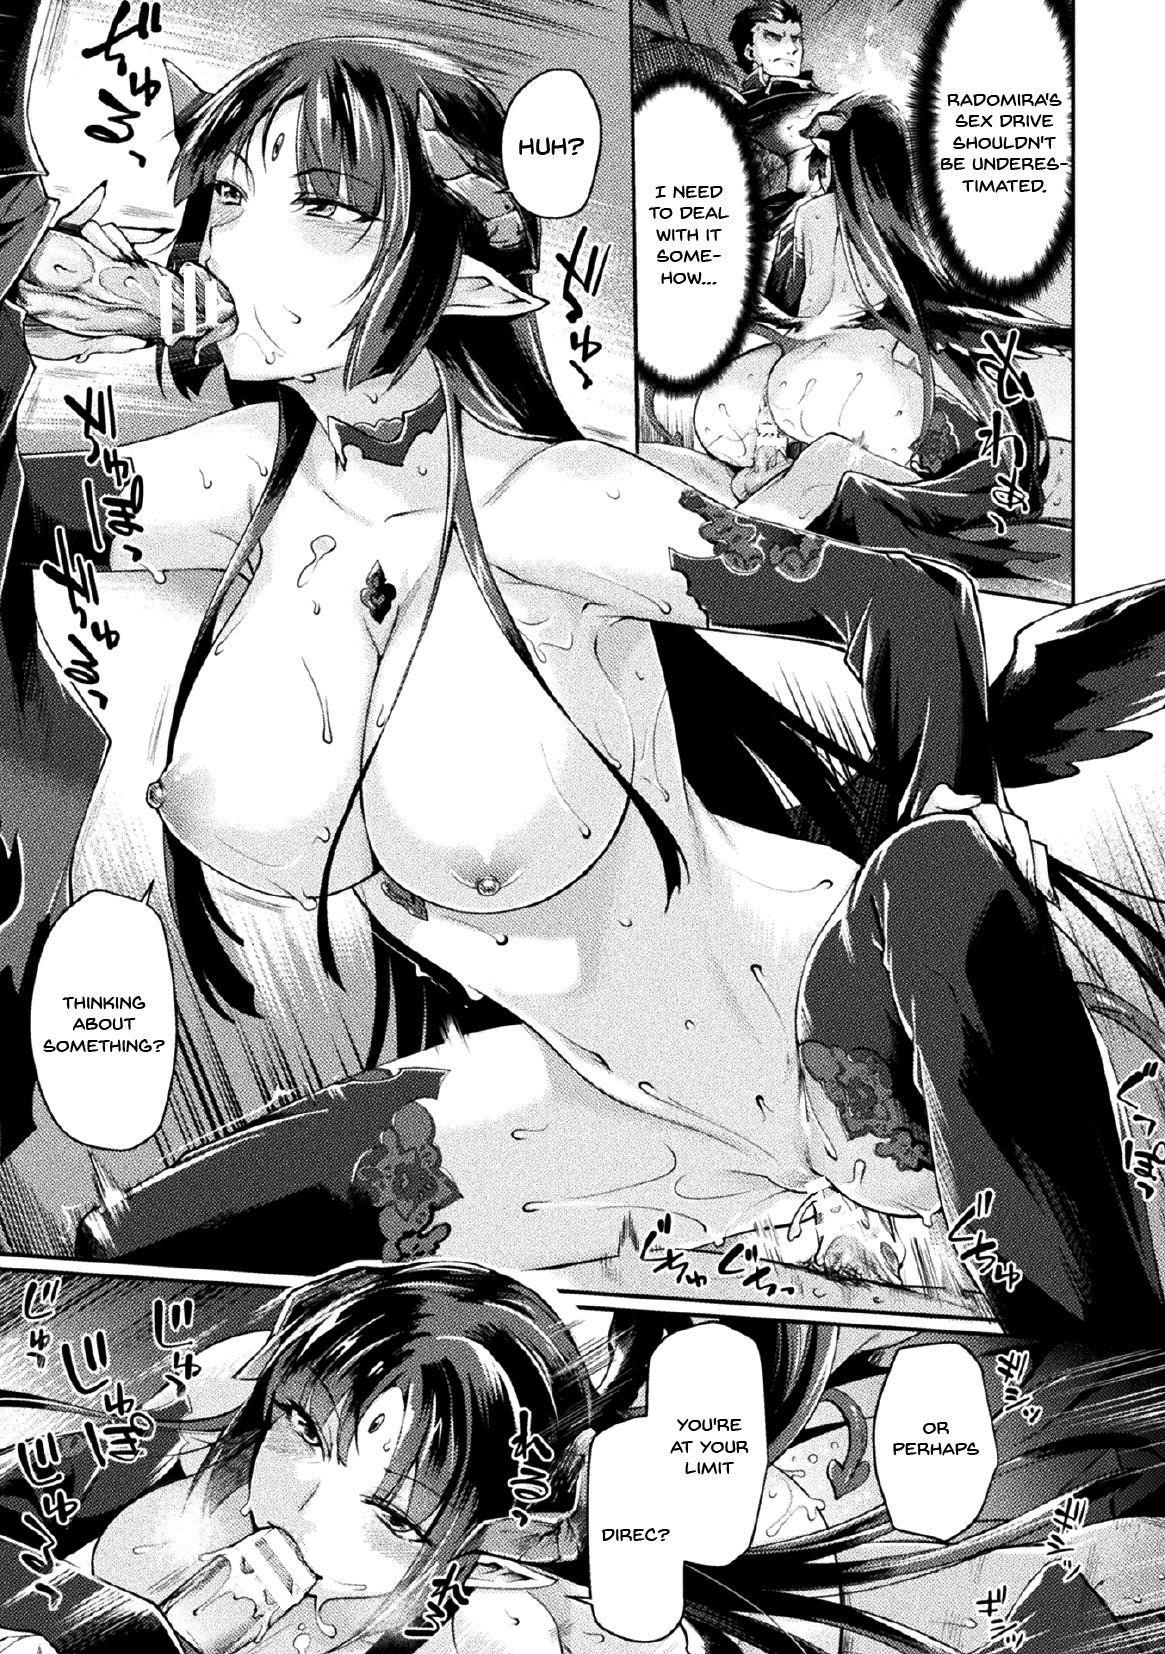 [Tsukitokage] Kuroinu II ~Inyoku ni Somaru Haitoku no Miyako, Futatabi~ THE COMIC | Kuroinu II ~Corrupted Town Stained With Lust~ THE COMIC Ch. 1 (Haiboku Otome Ecstasy Vol. 17) [English] {Doujins.com} [Digital] 10